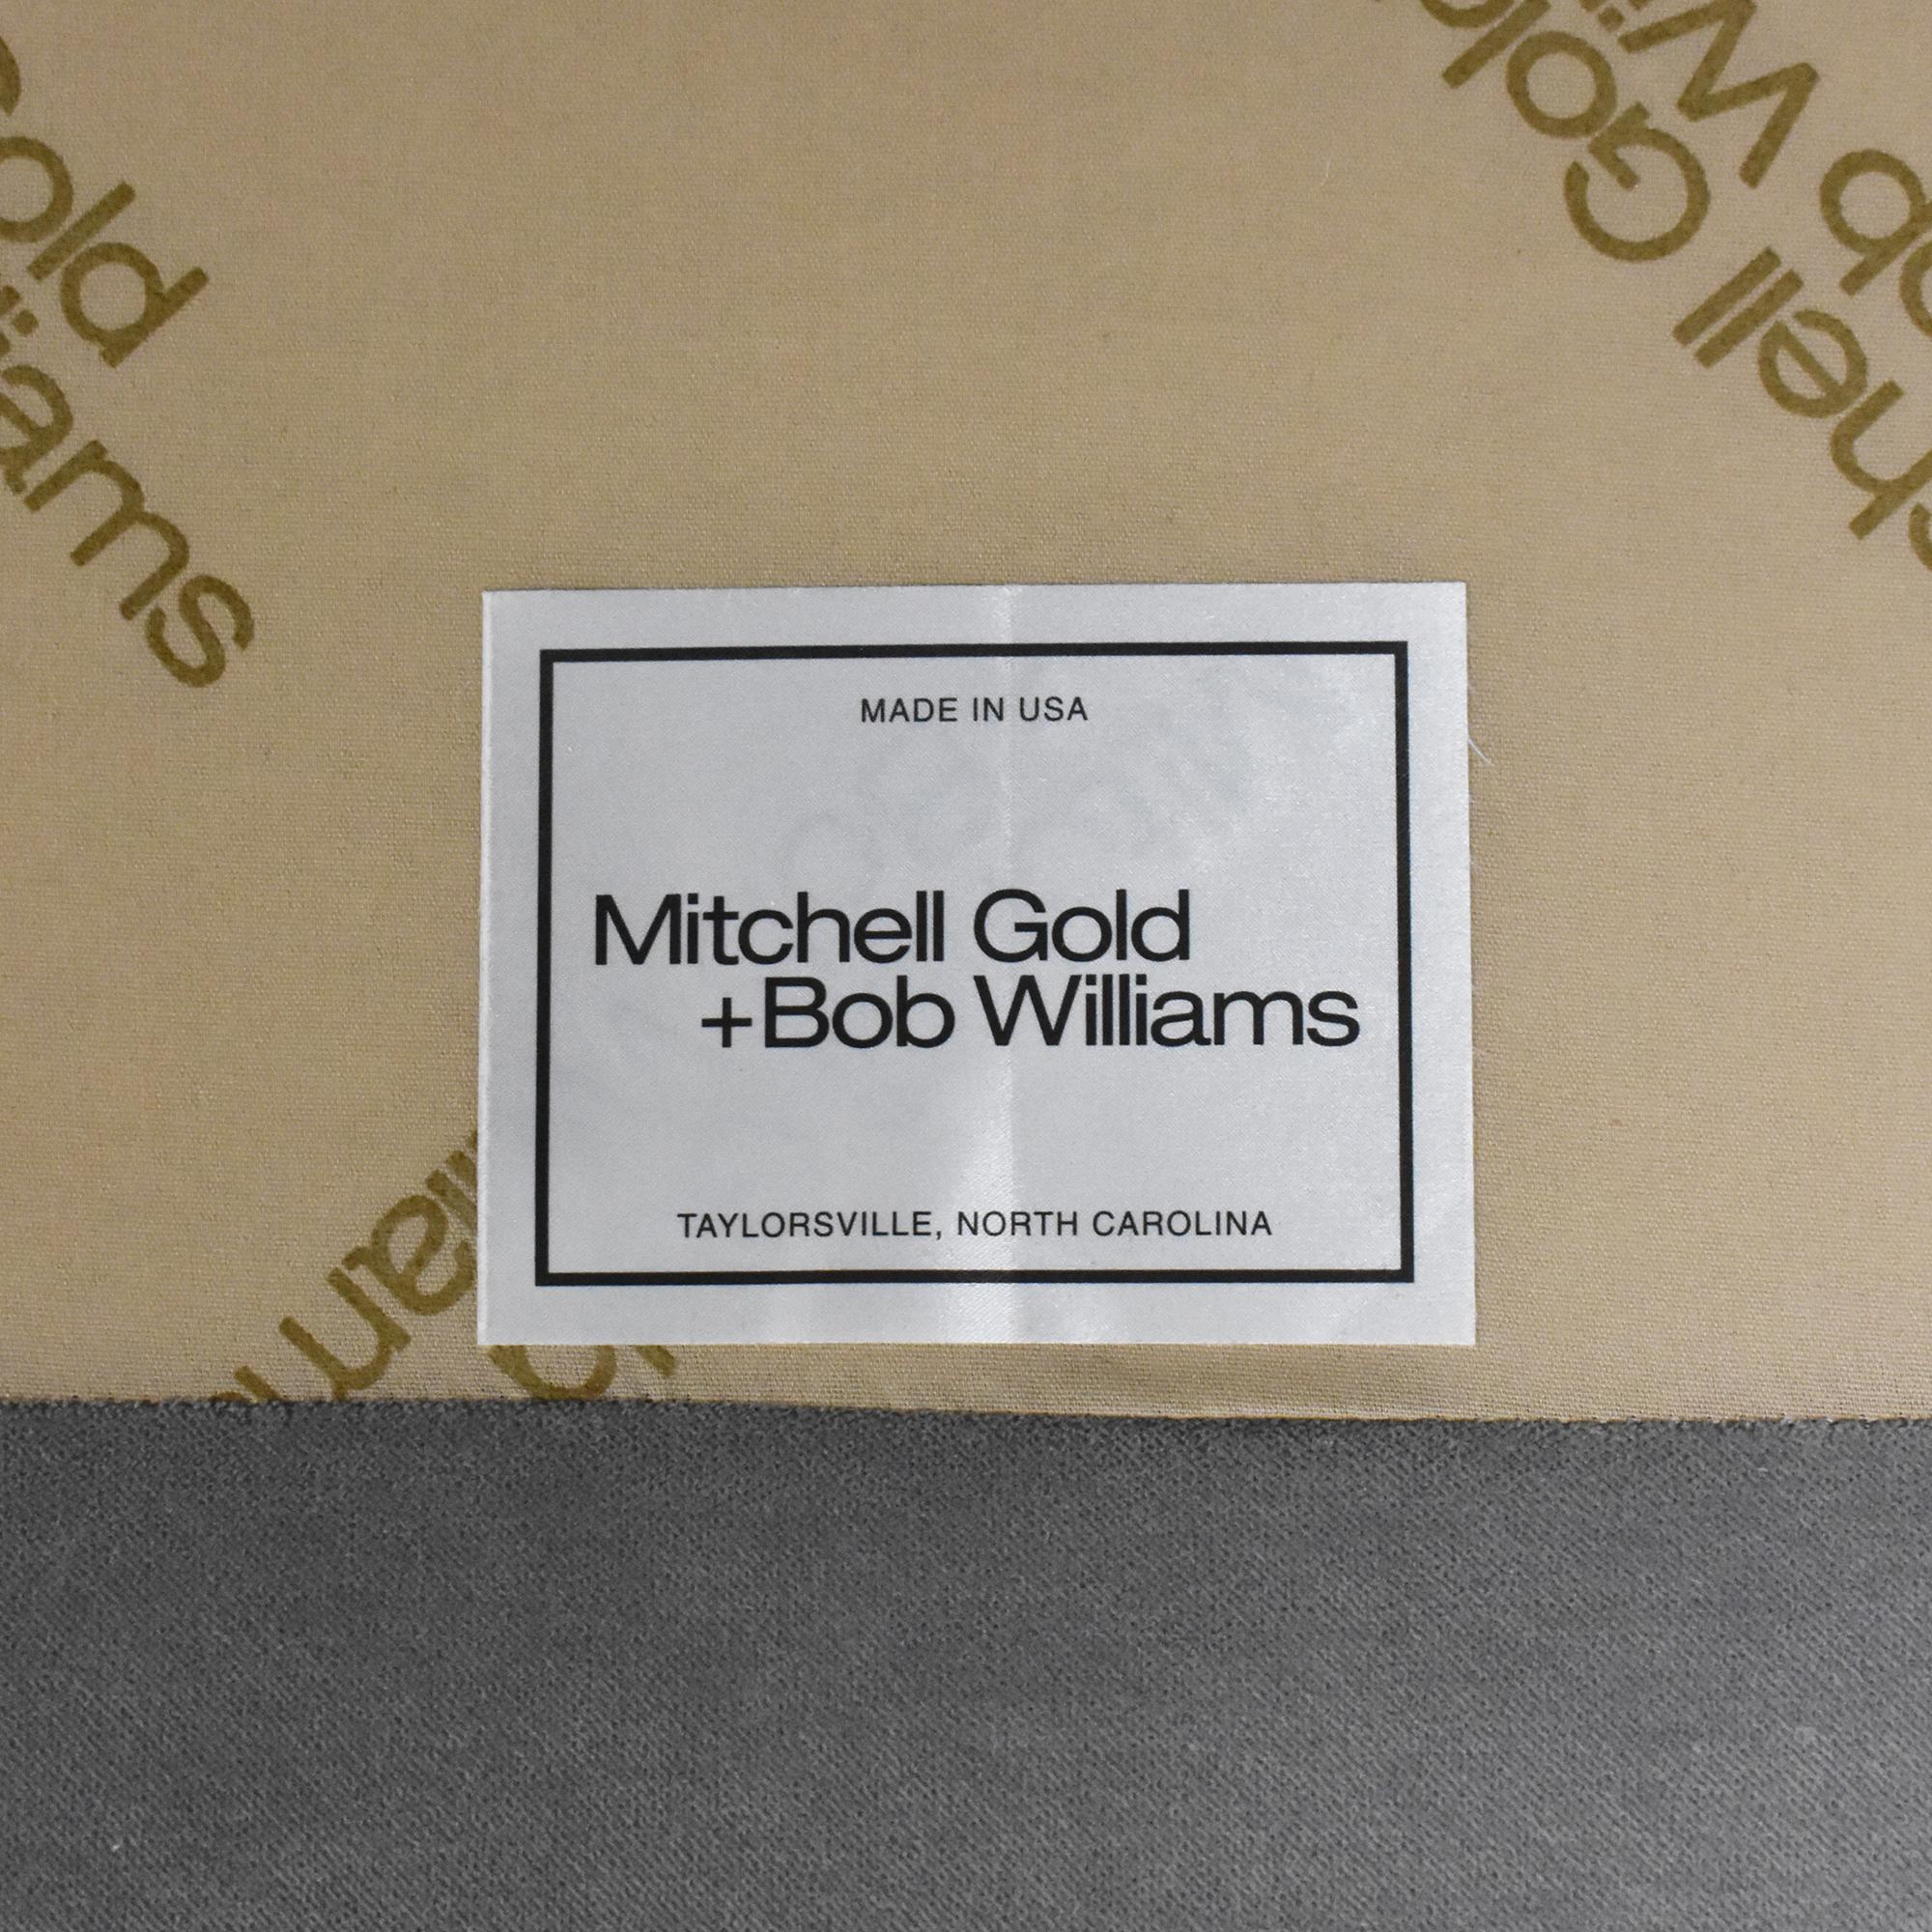 shop Mitchell Gold + Bob Williams Keaton Chaise Sectional Sofa Mitchell Gold + Bob Williams Sofas